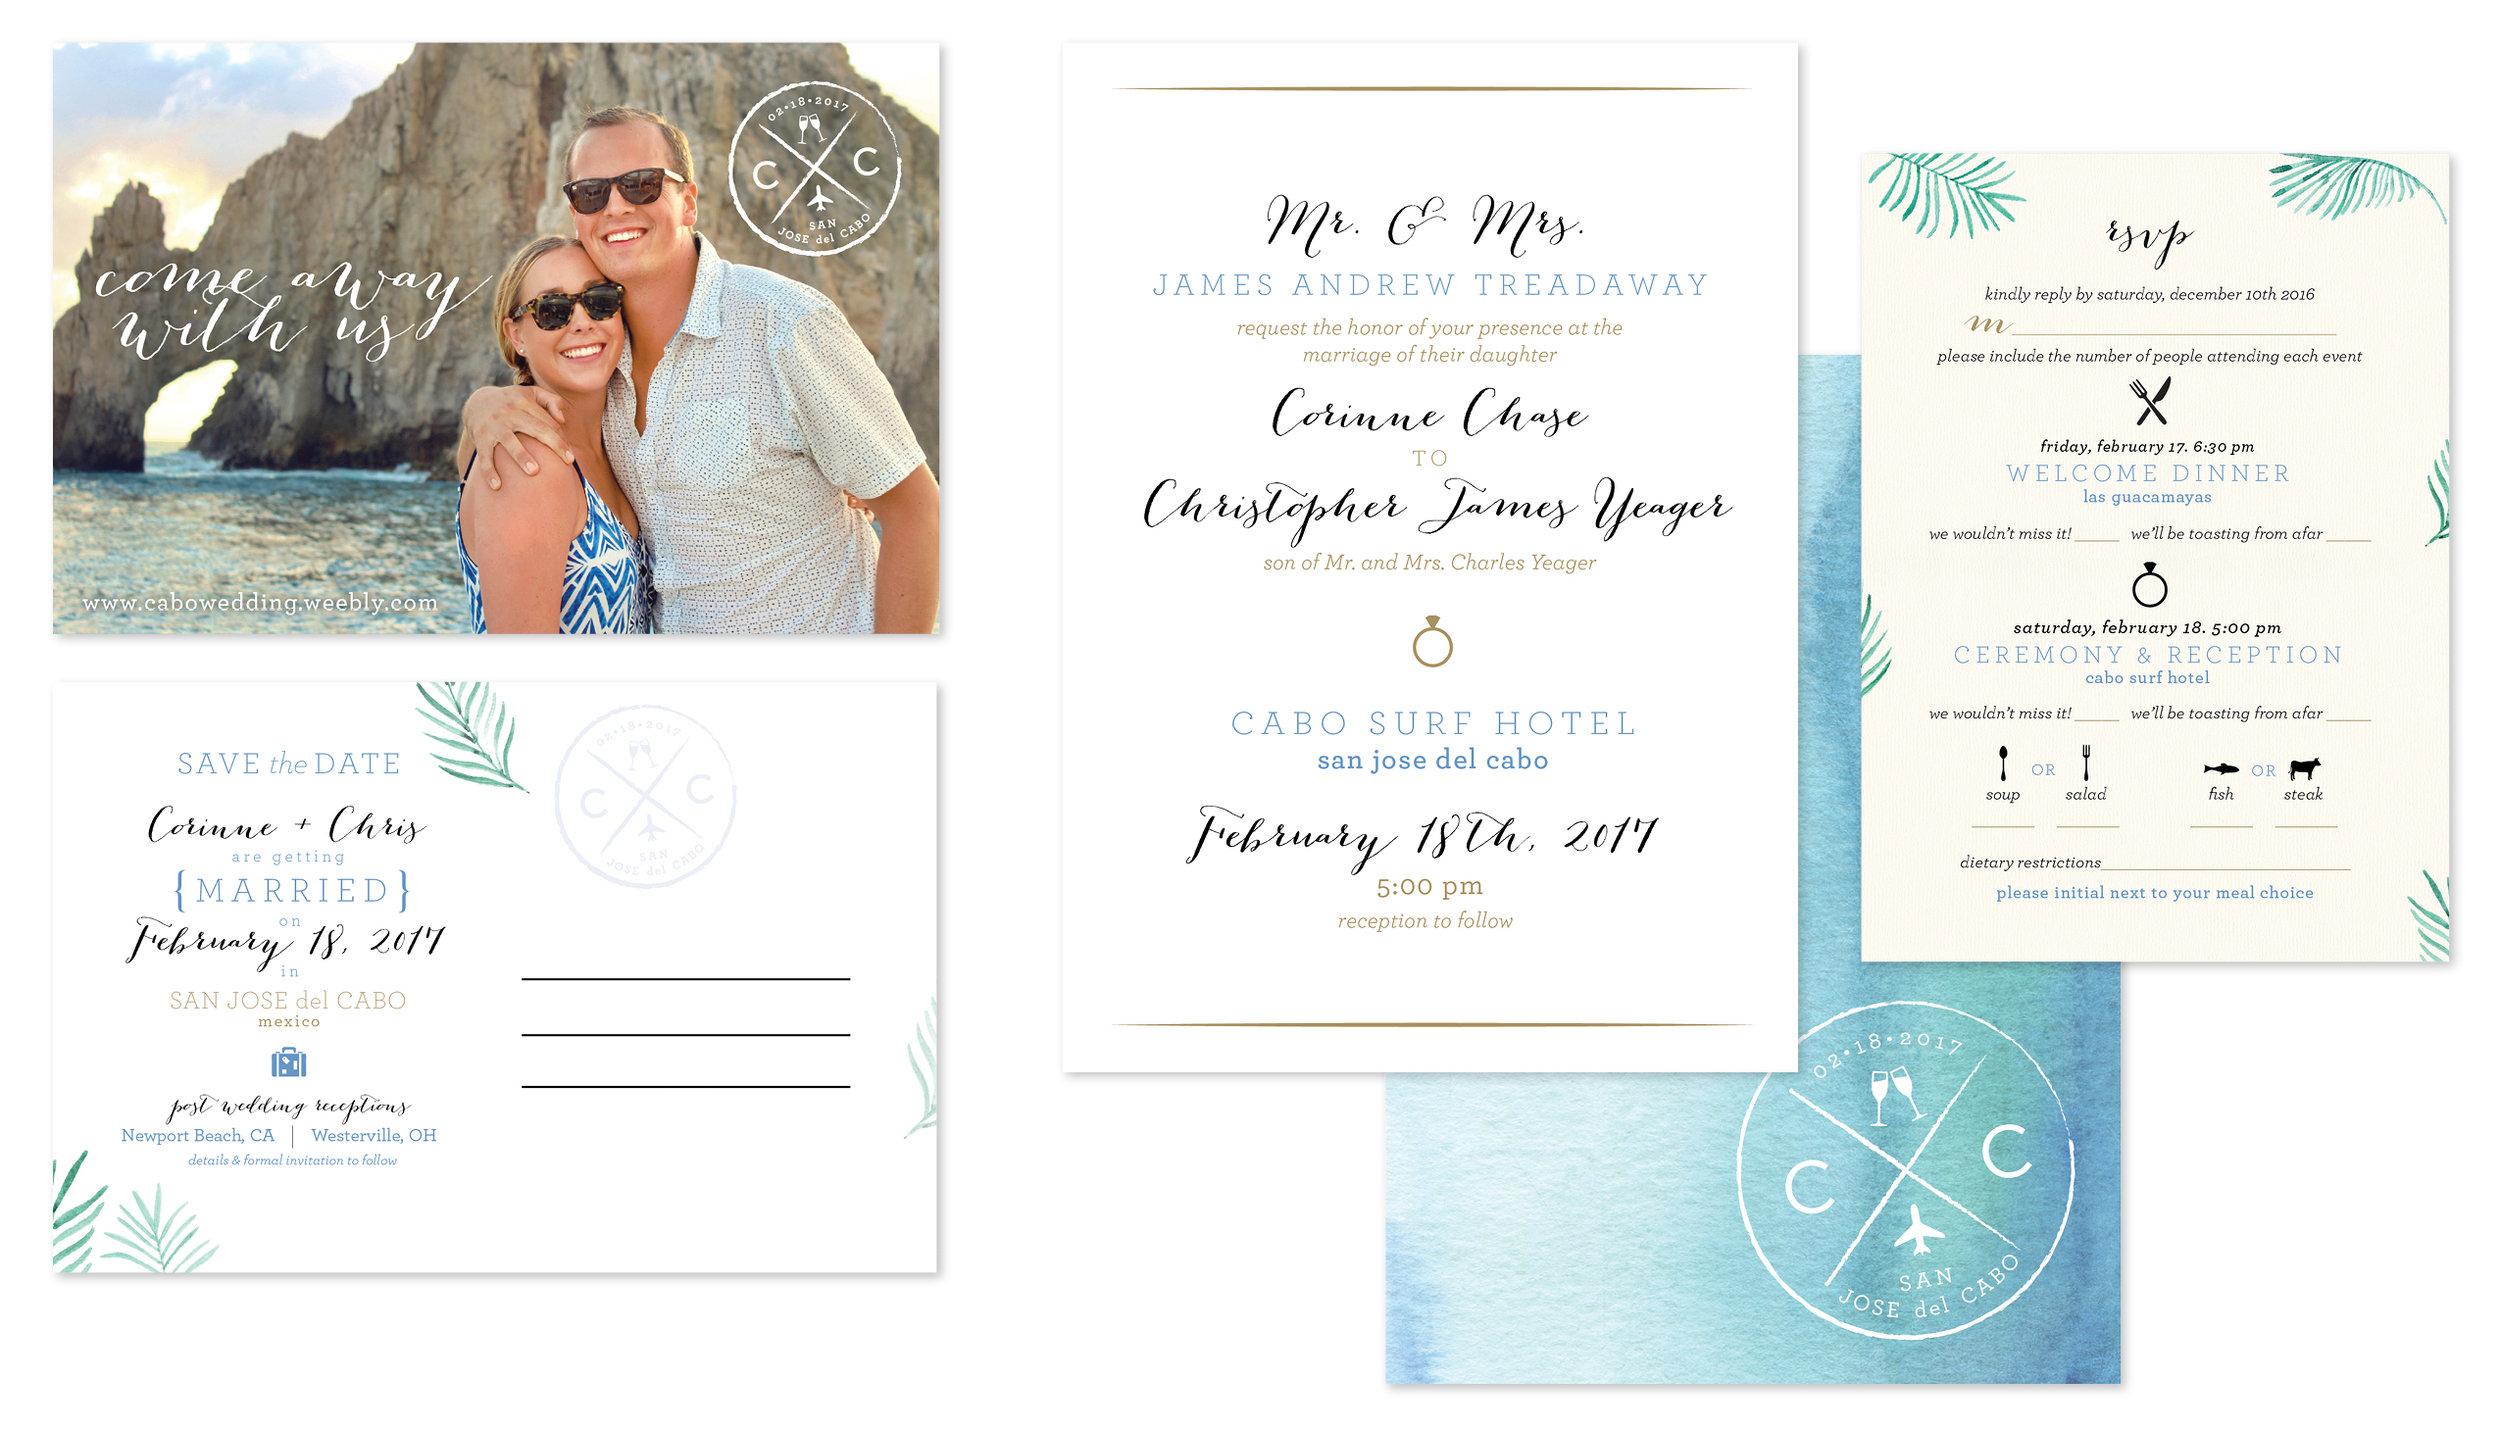 save the date, wedding invitation front & back, RSVP card